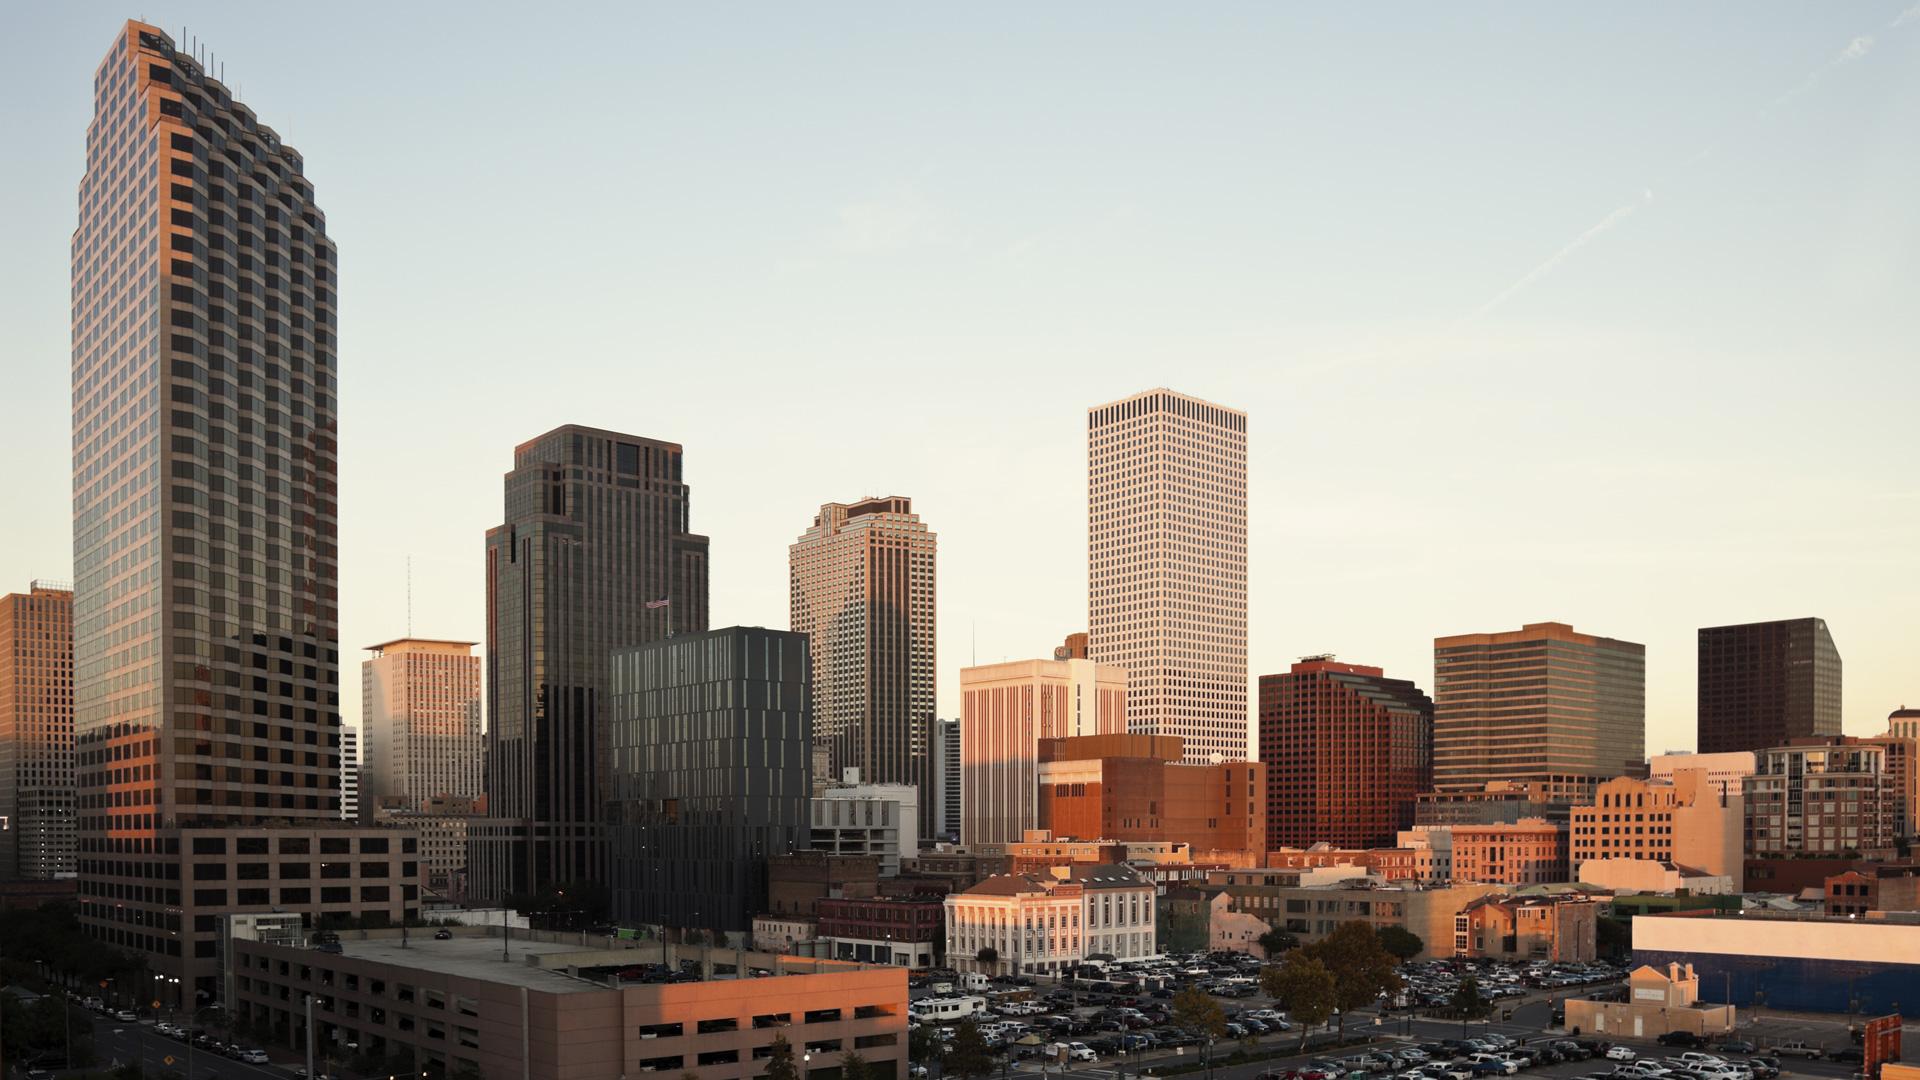 New Orleans, Louisiana skyline